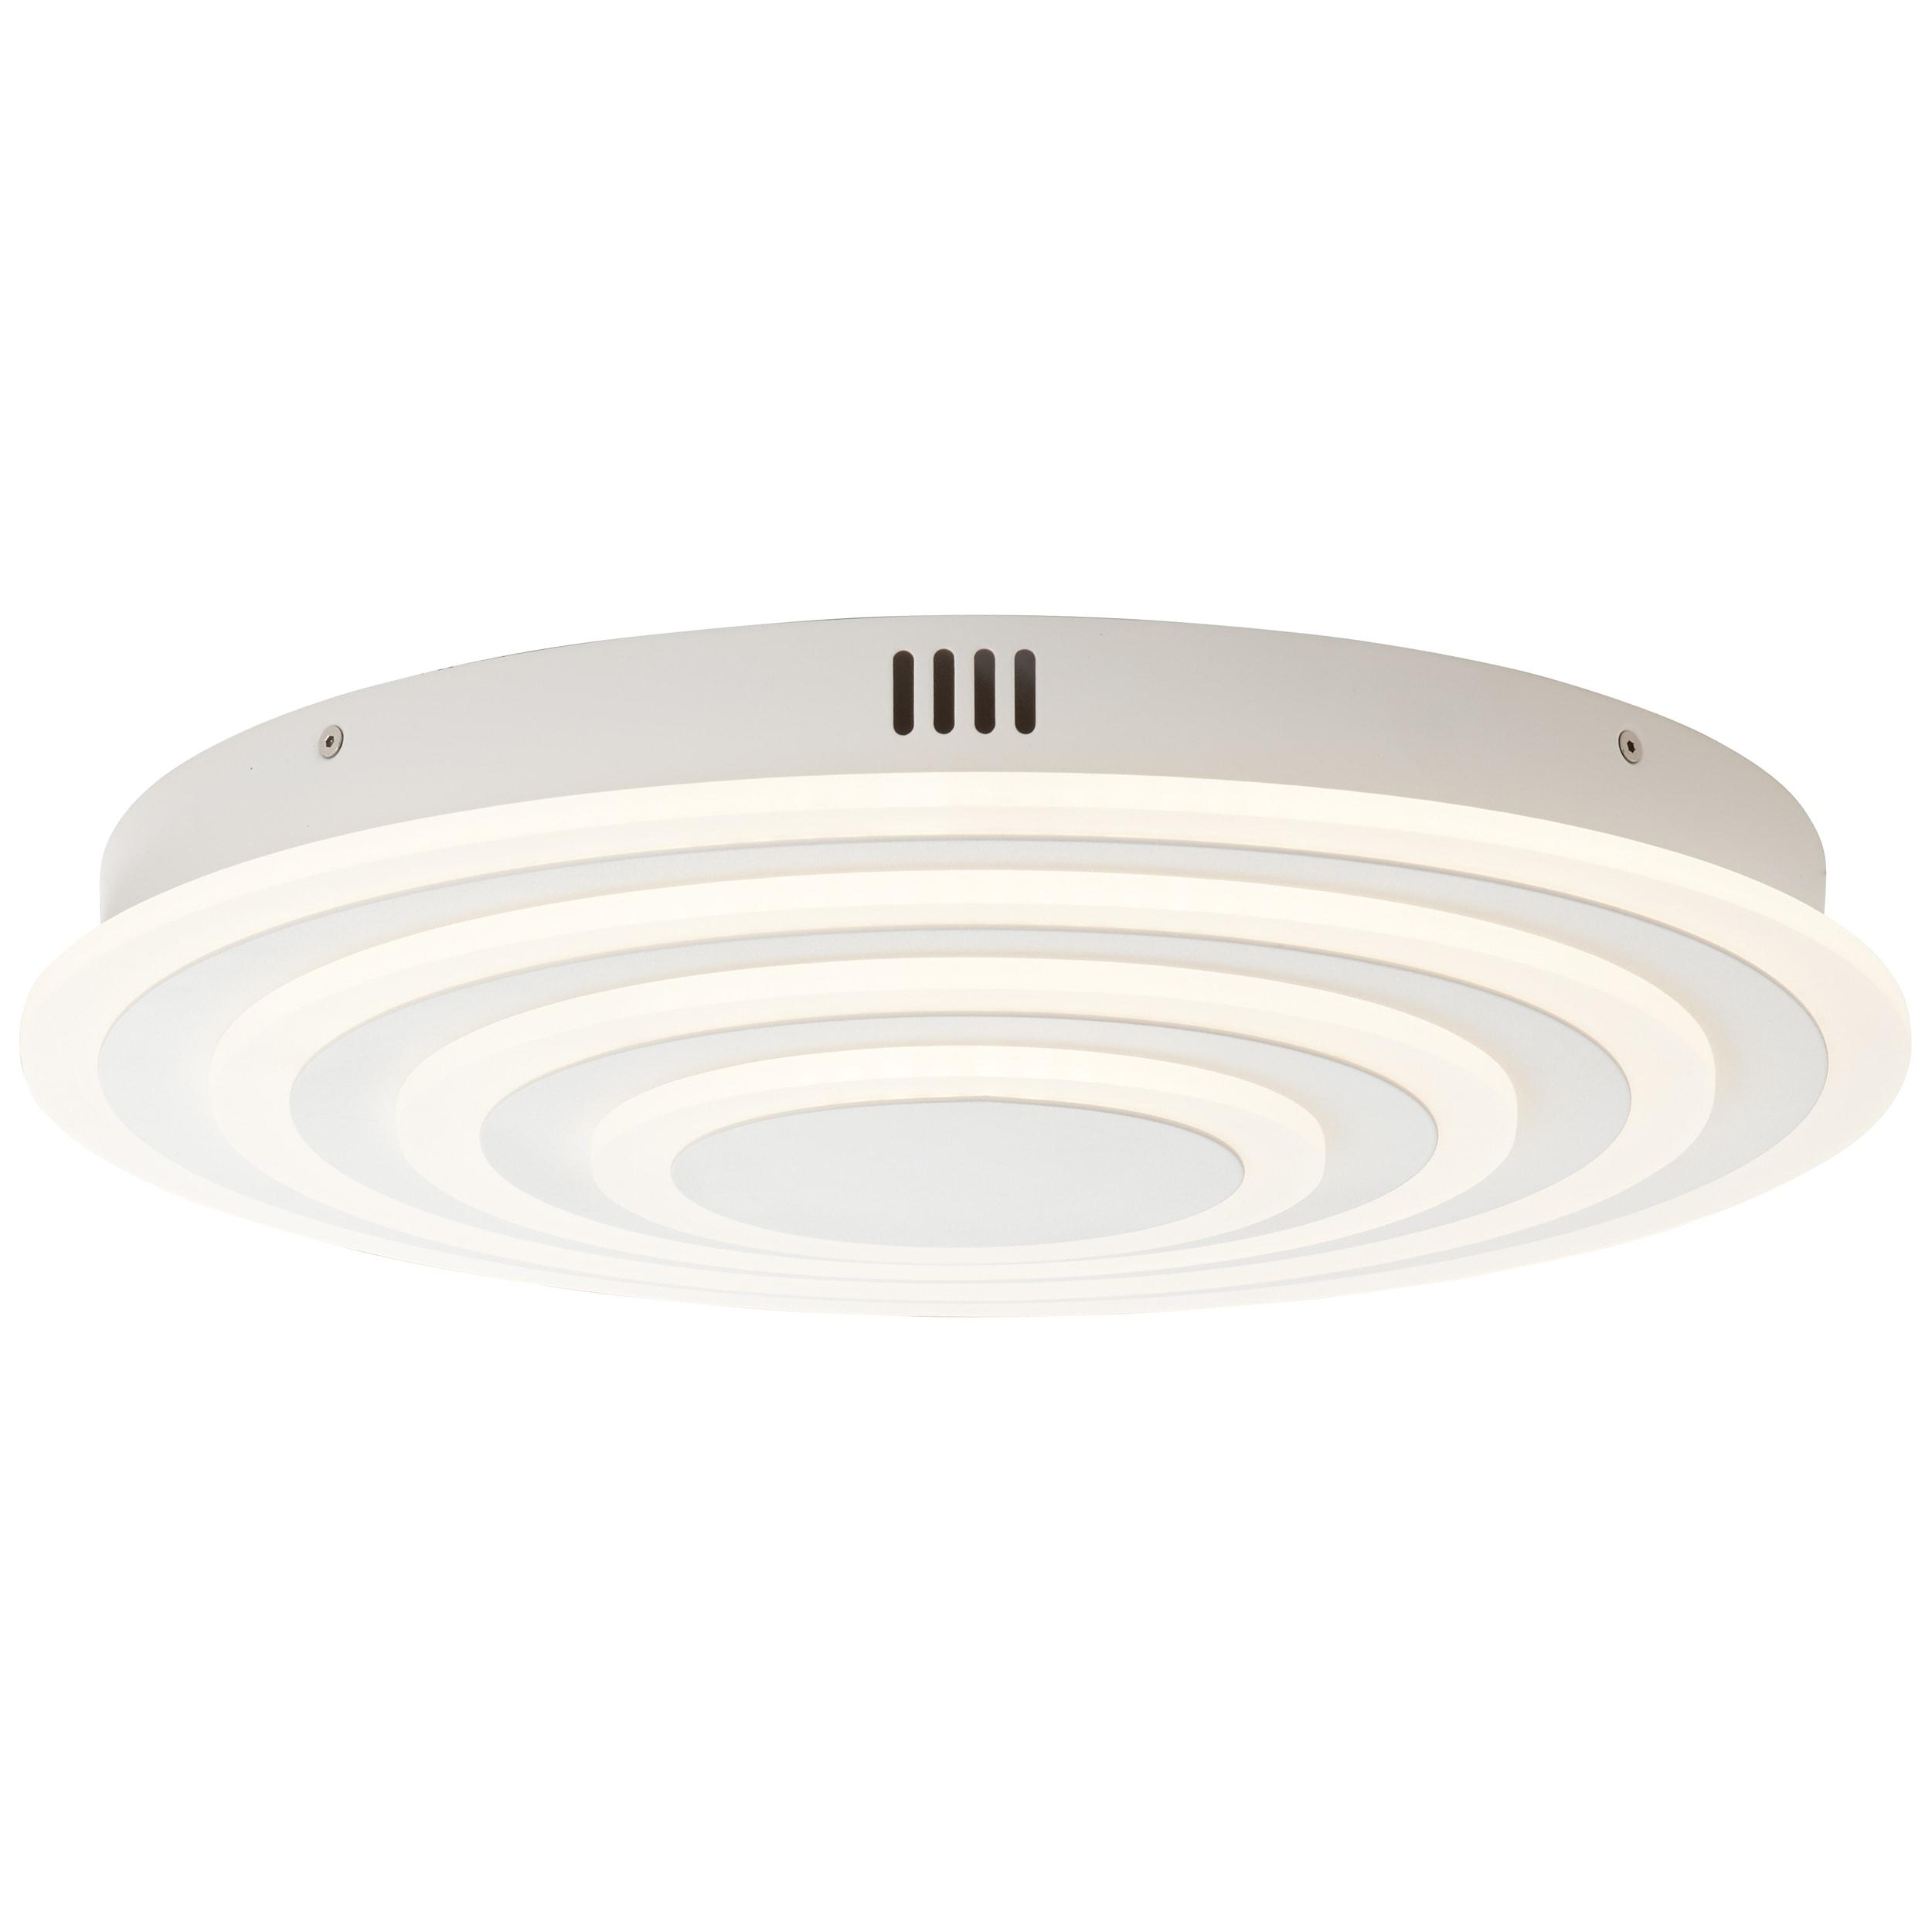 AEG Caresa LED Deckenleuchte 47cm sand/weiß